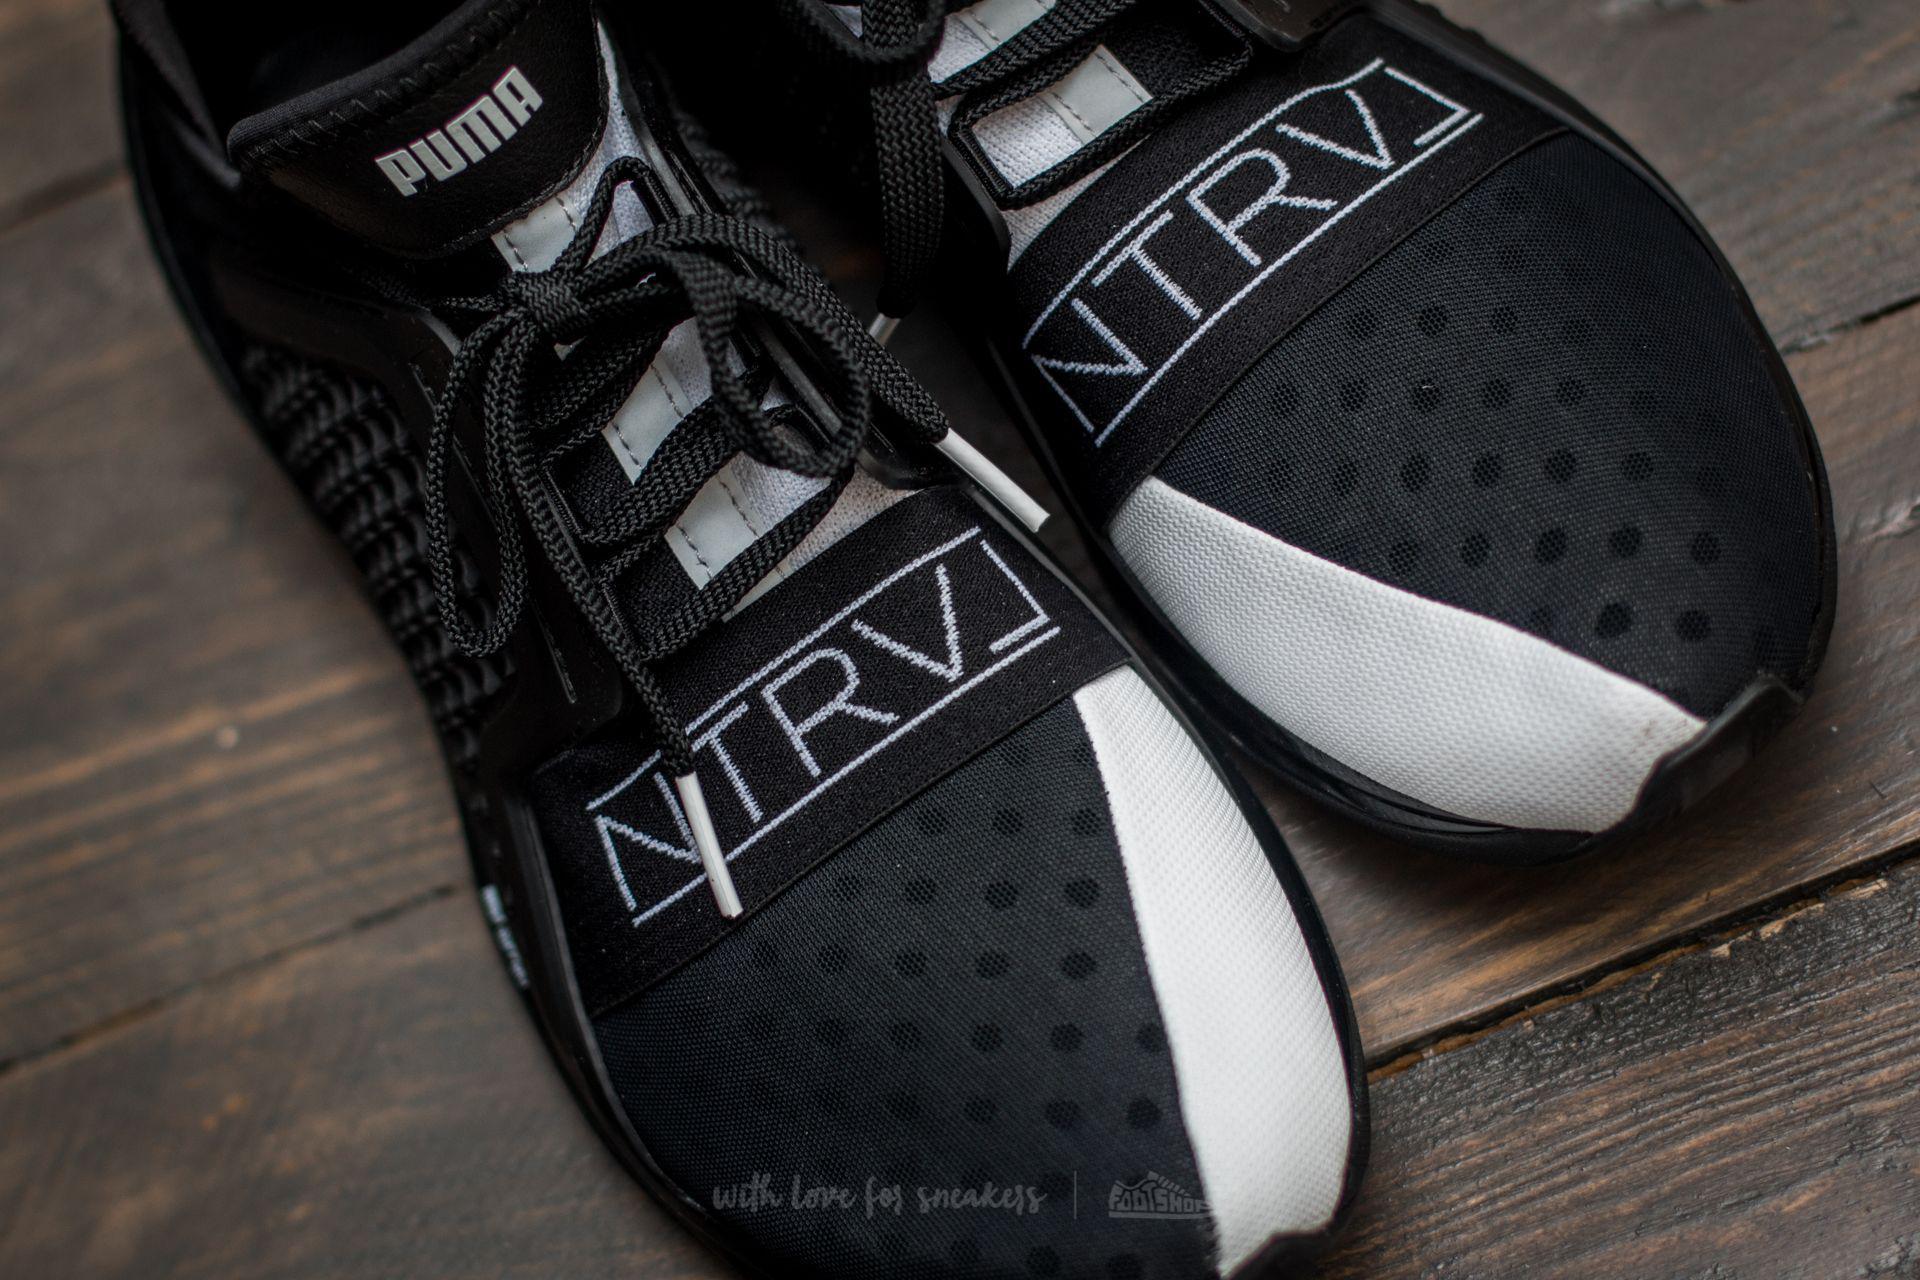 15d93602a88d Lyst - PUMA X Staple Ignite Limitless Black- White in Black for Men